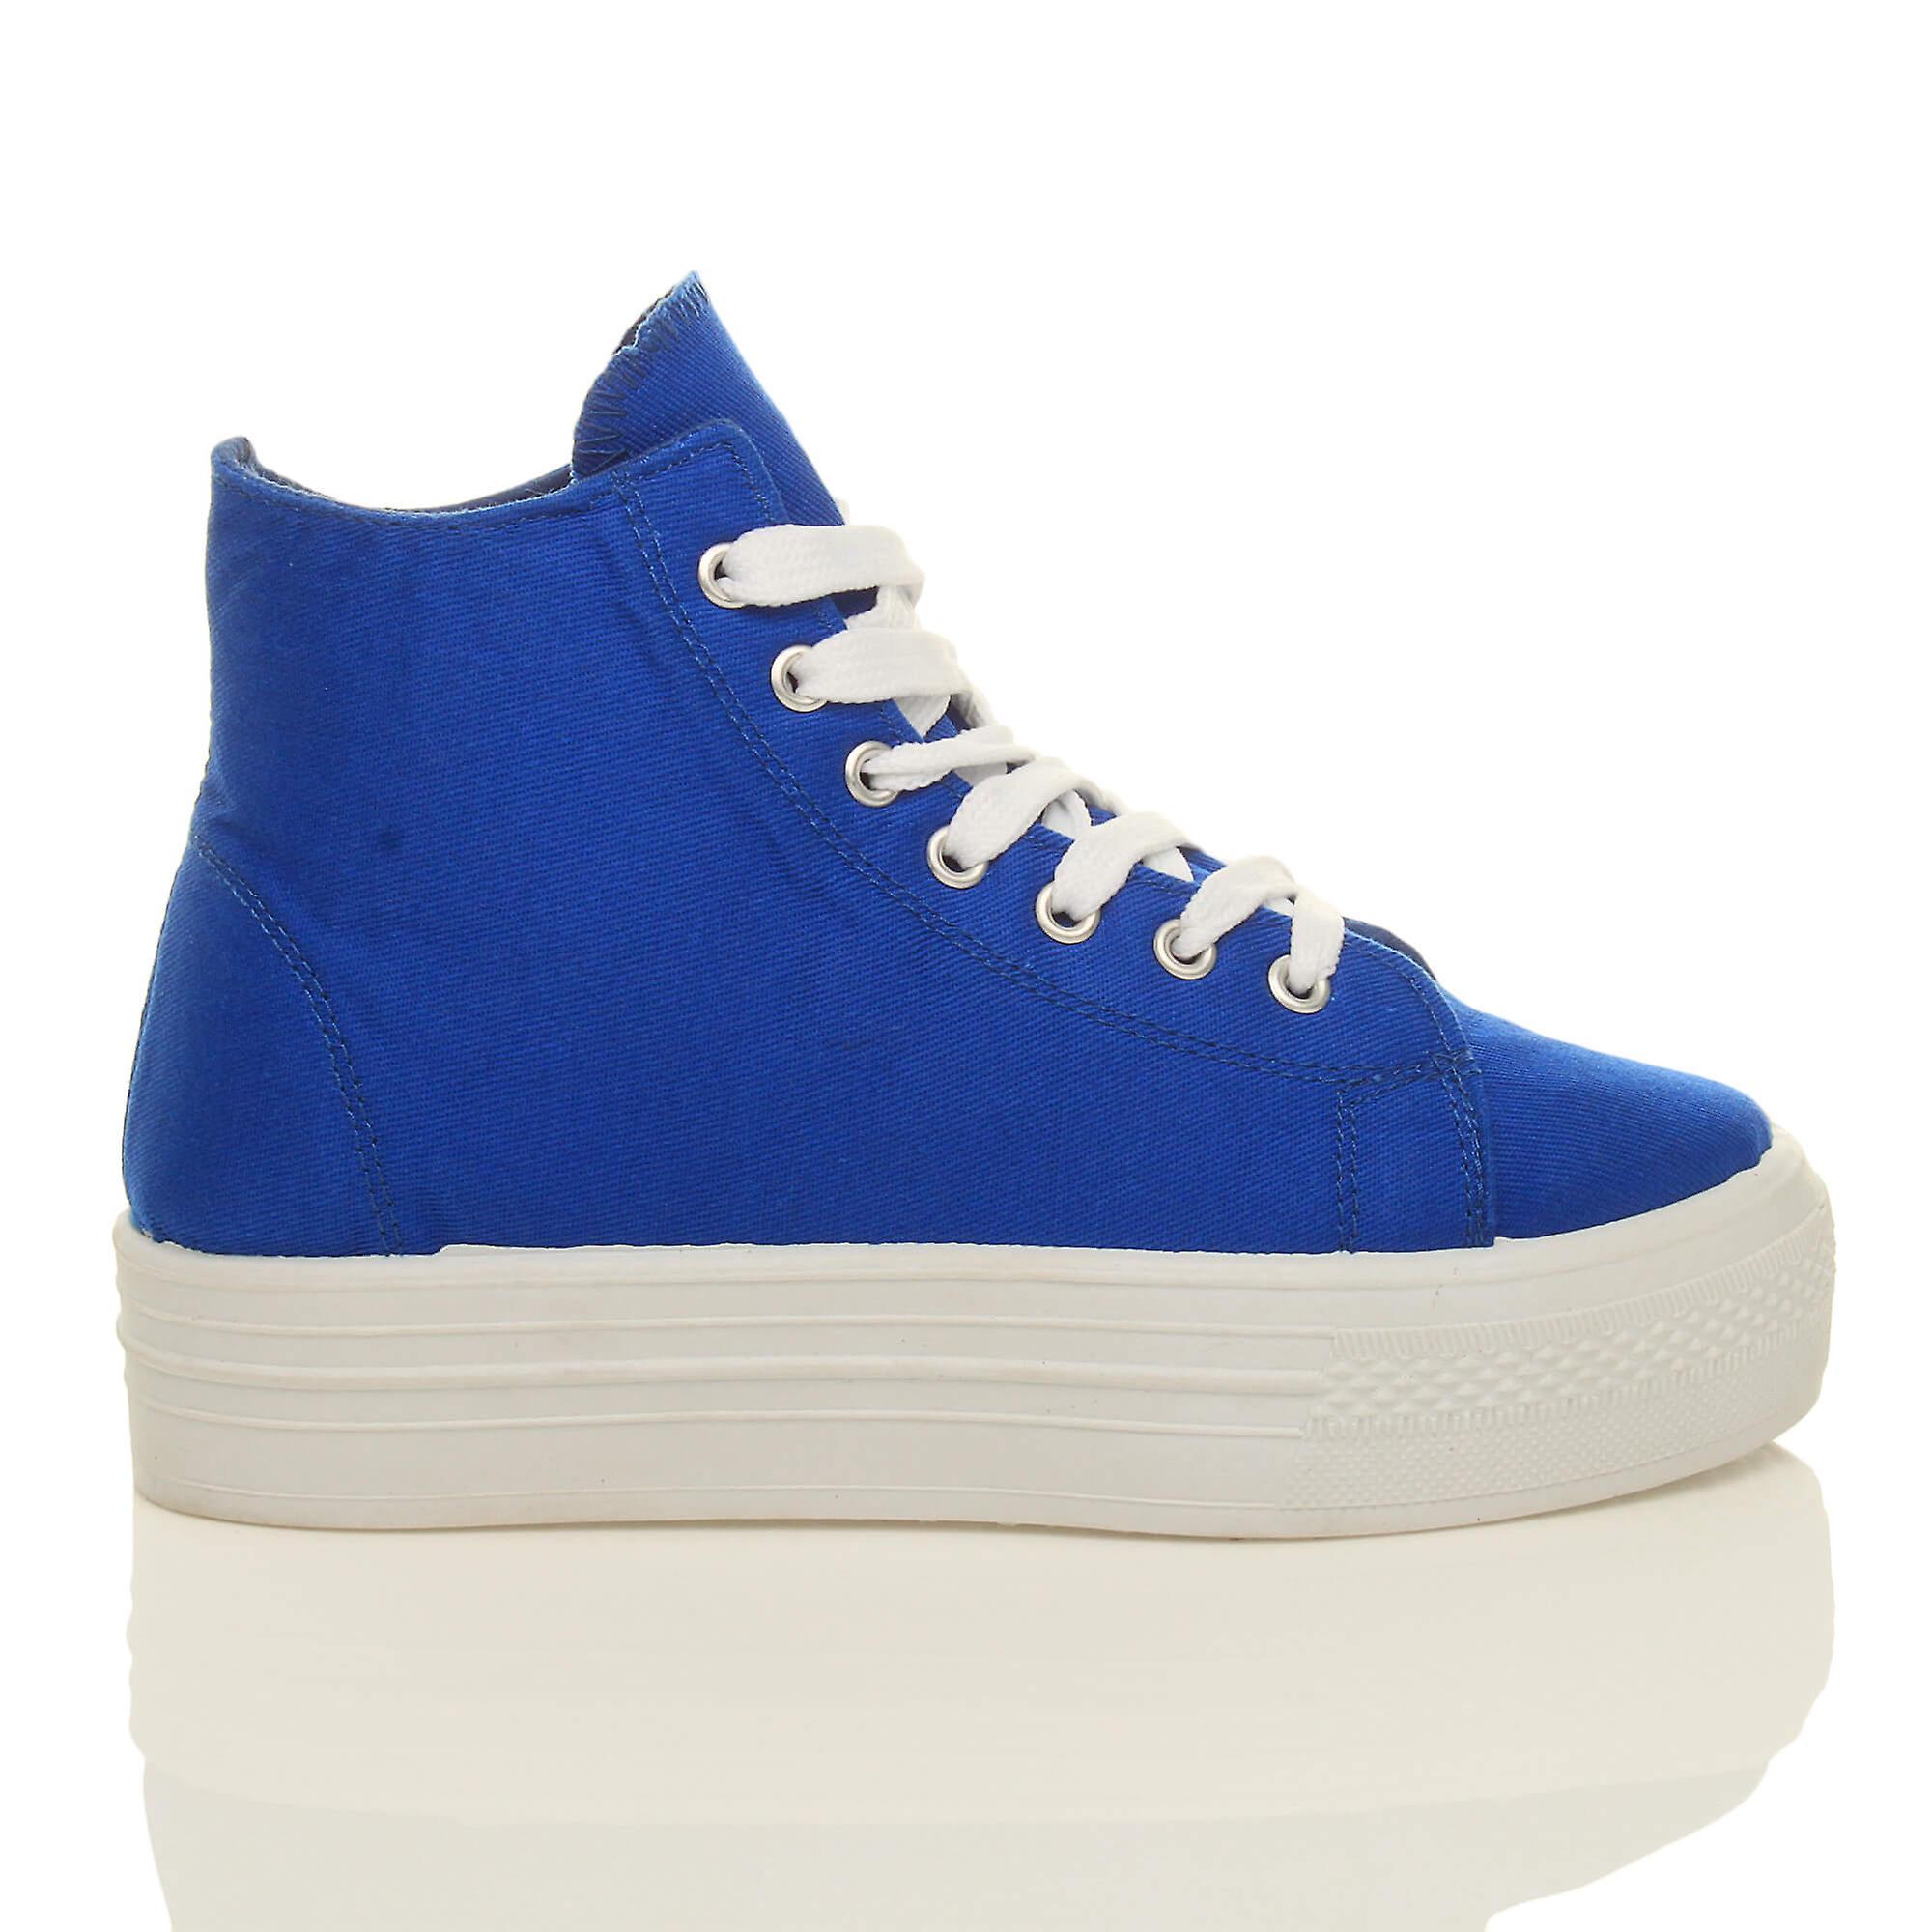 shoes high hi womens ankle platform Ajvani top flatform trainers boots qgzwPU